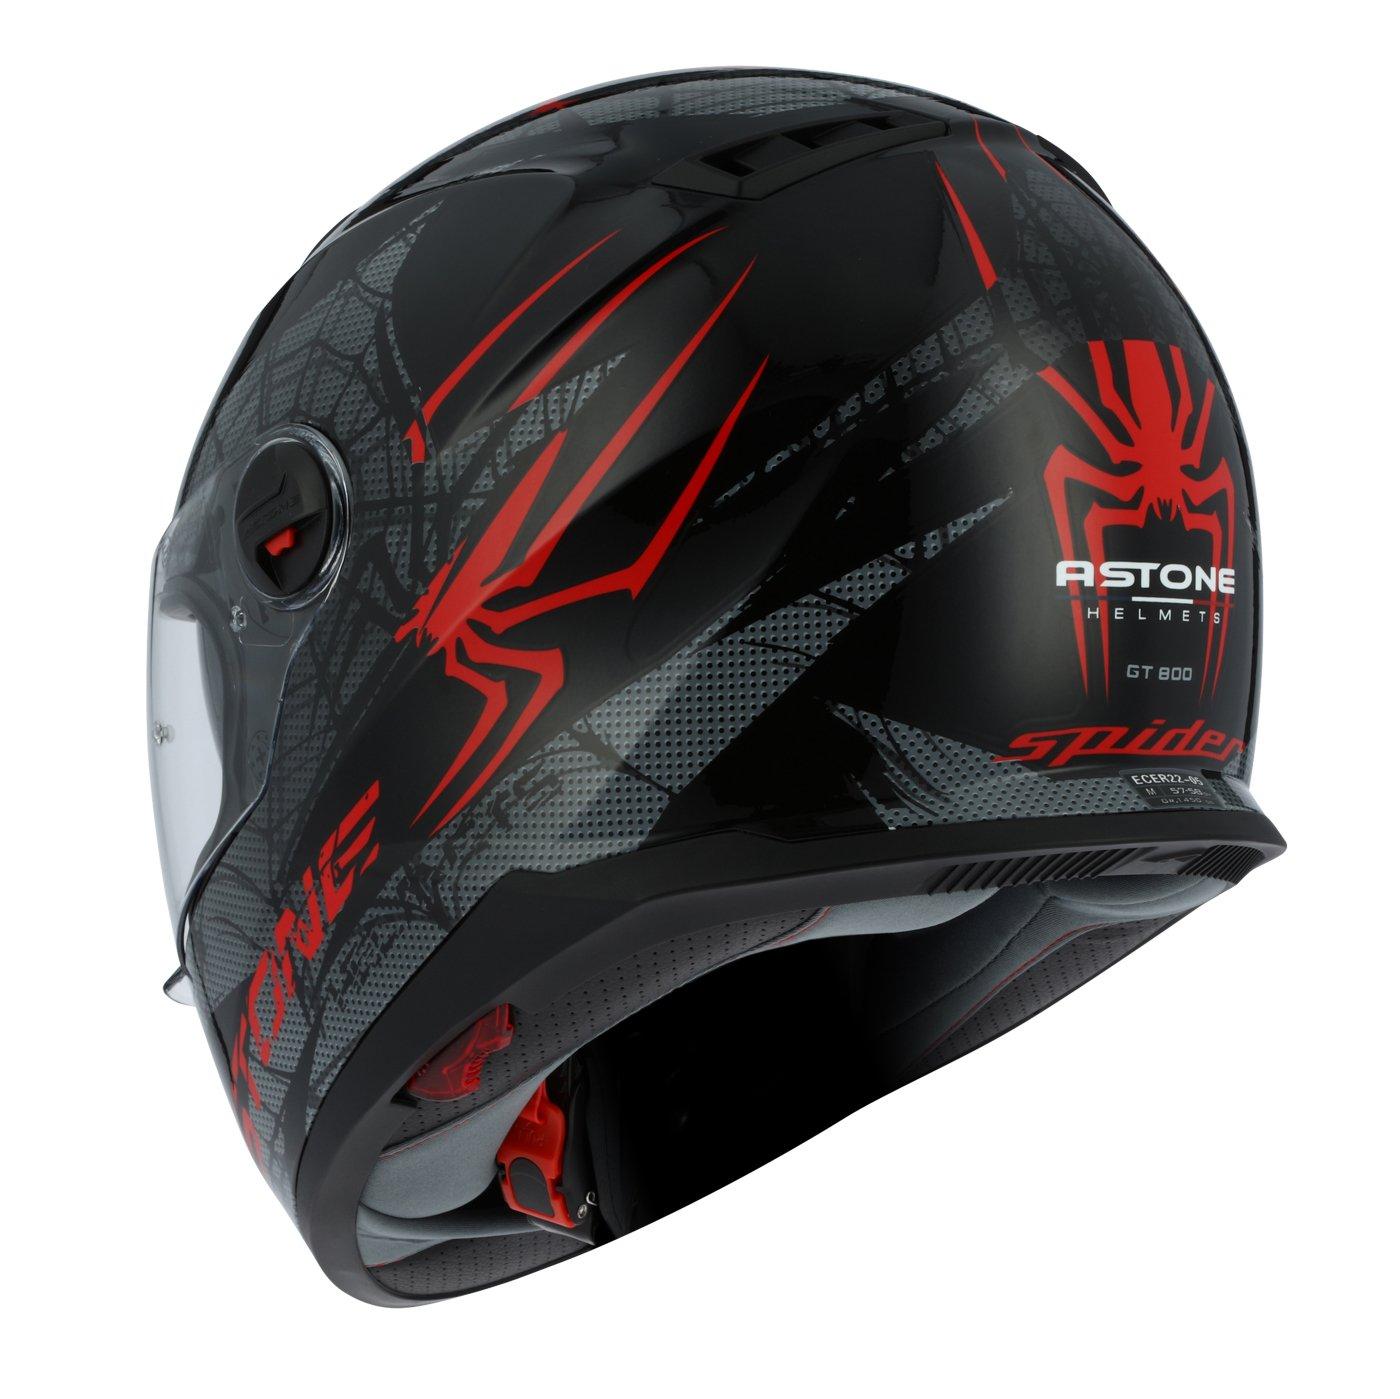 Amazon.es: Astone Helmets gt800-spider-rbm casco Moto Integral GT 800, rojo/negro, talla M